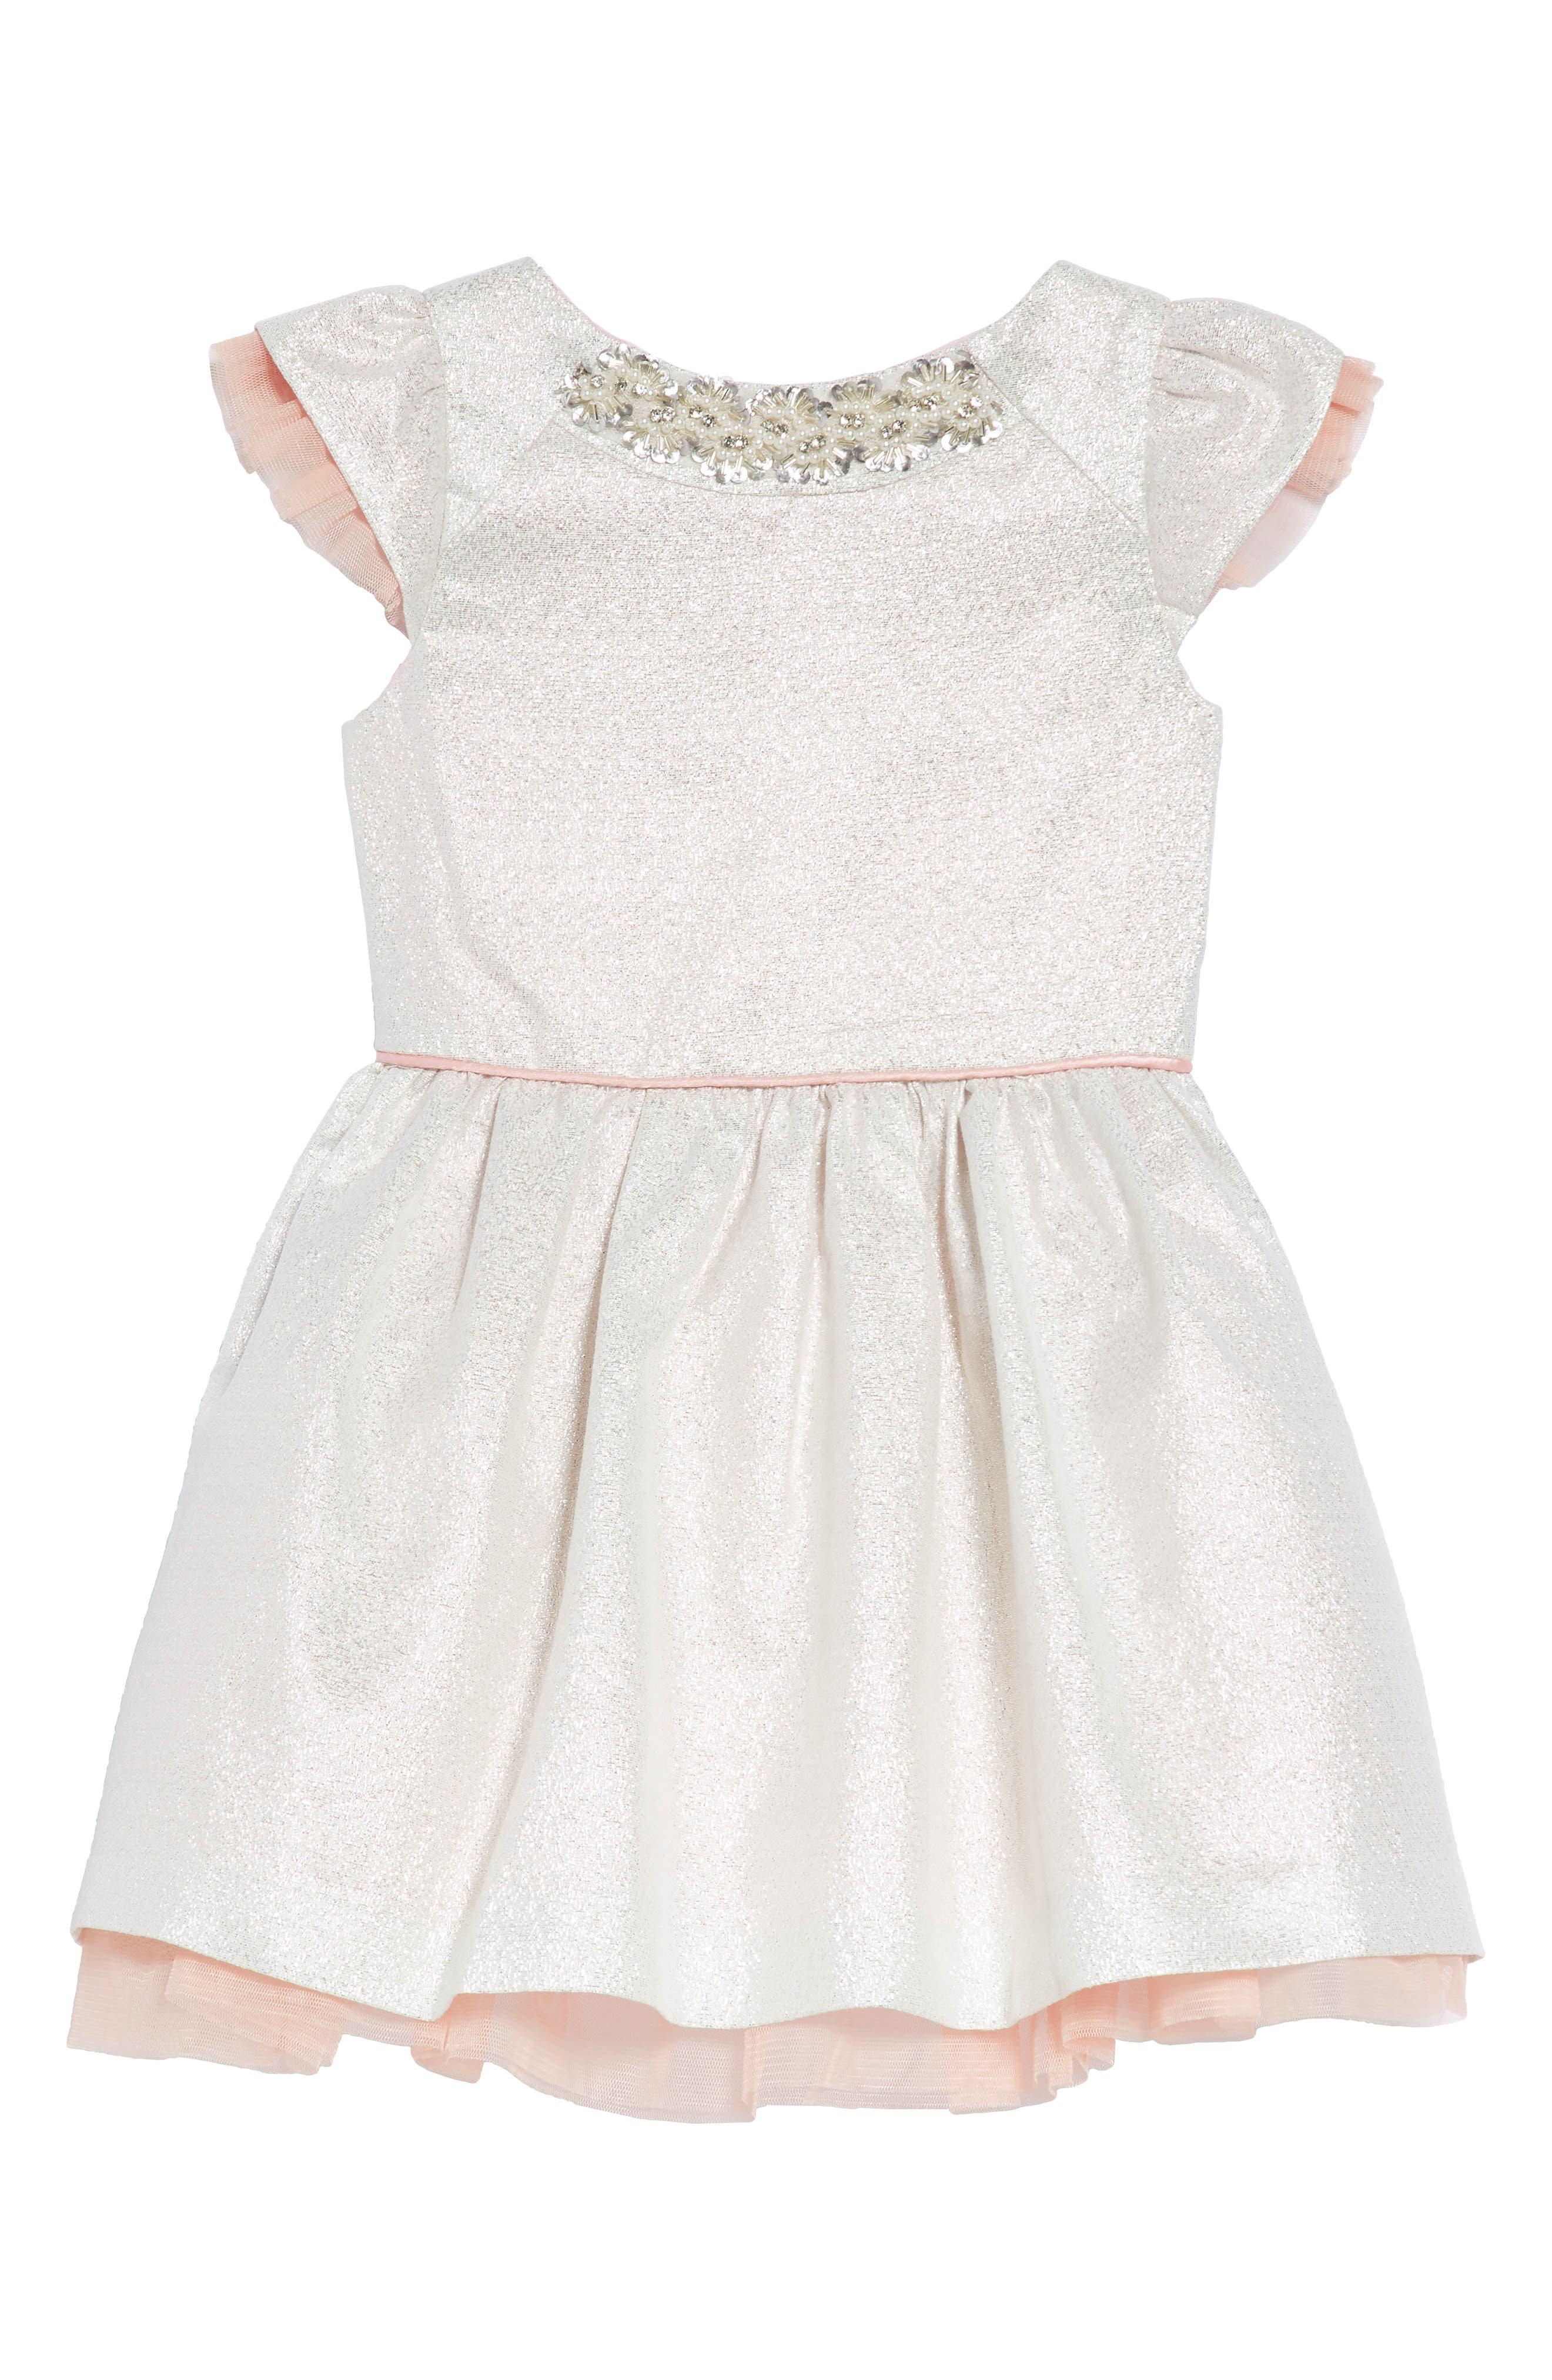 Oh My Embellished Fit & Flare Dress (Toddler Girls, Little Girls & Big Girls)